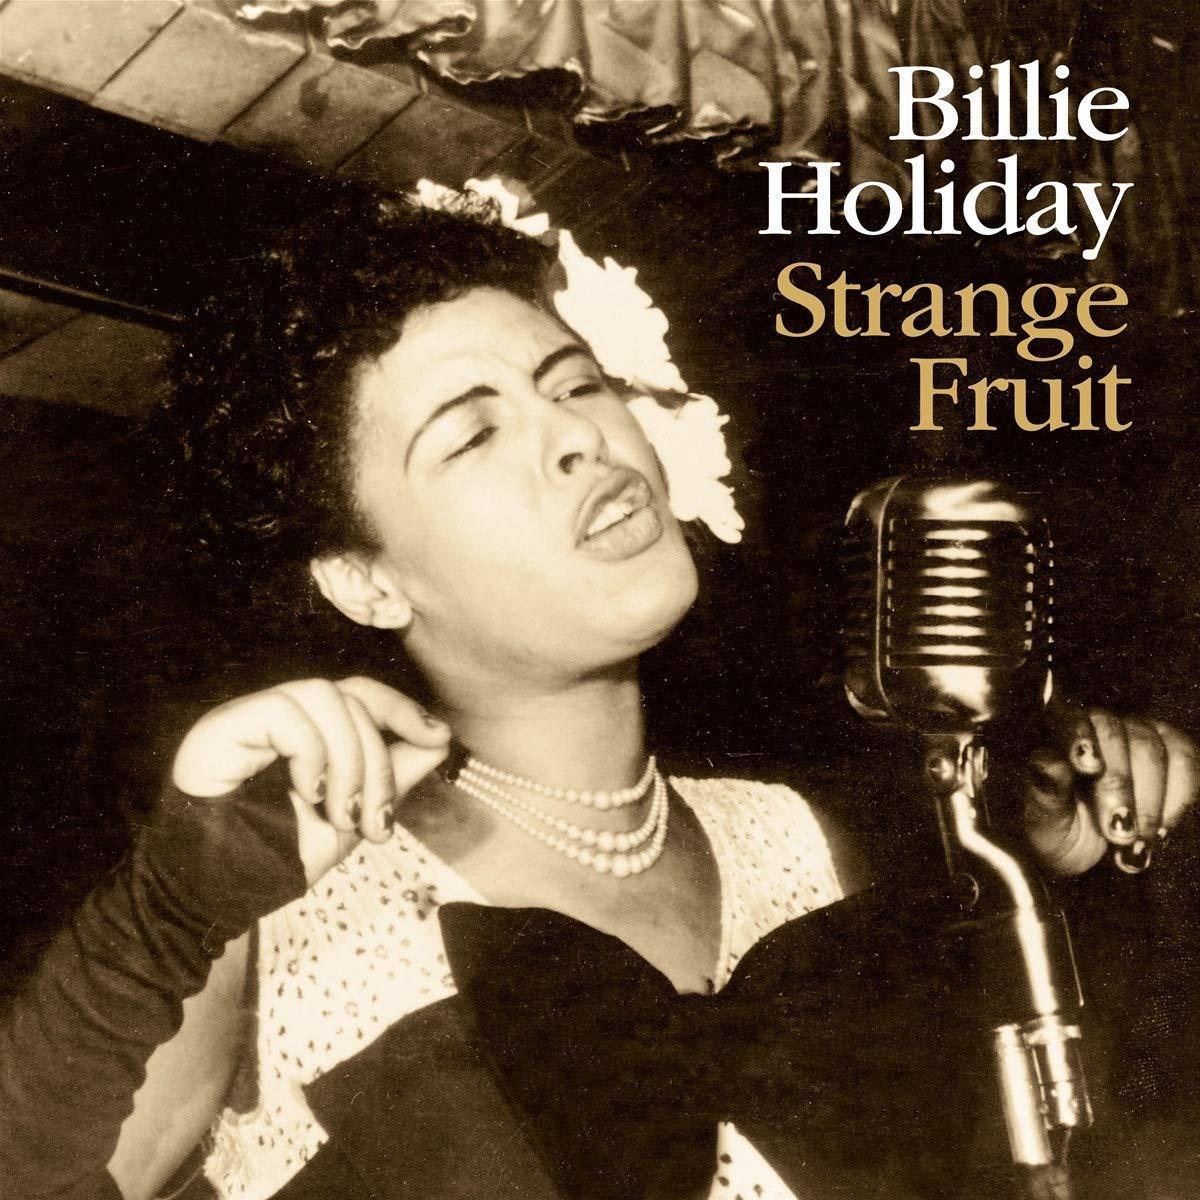 Billie Holiday - Strange Fruit [VINYL] - Amazon.com Music